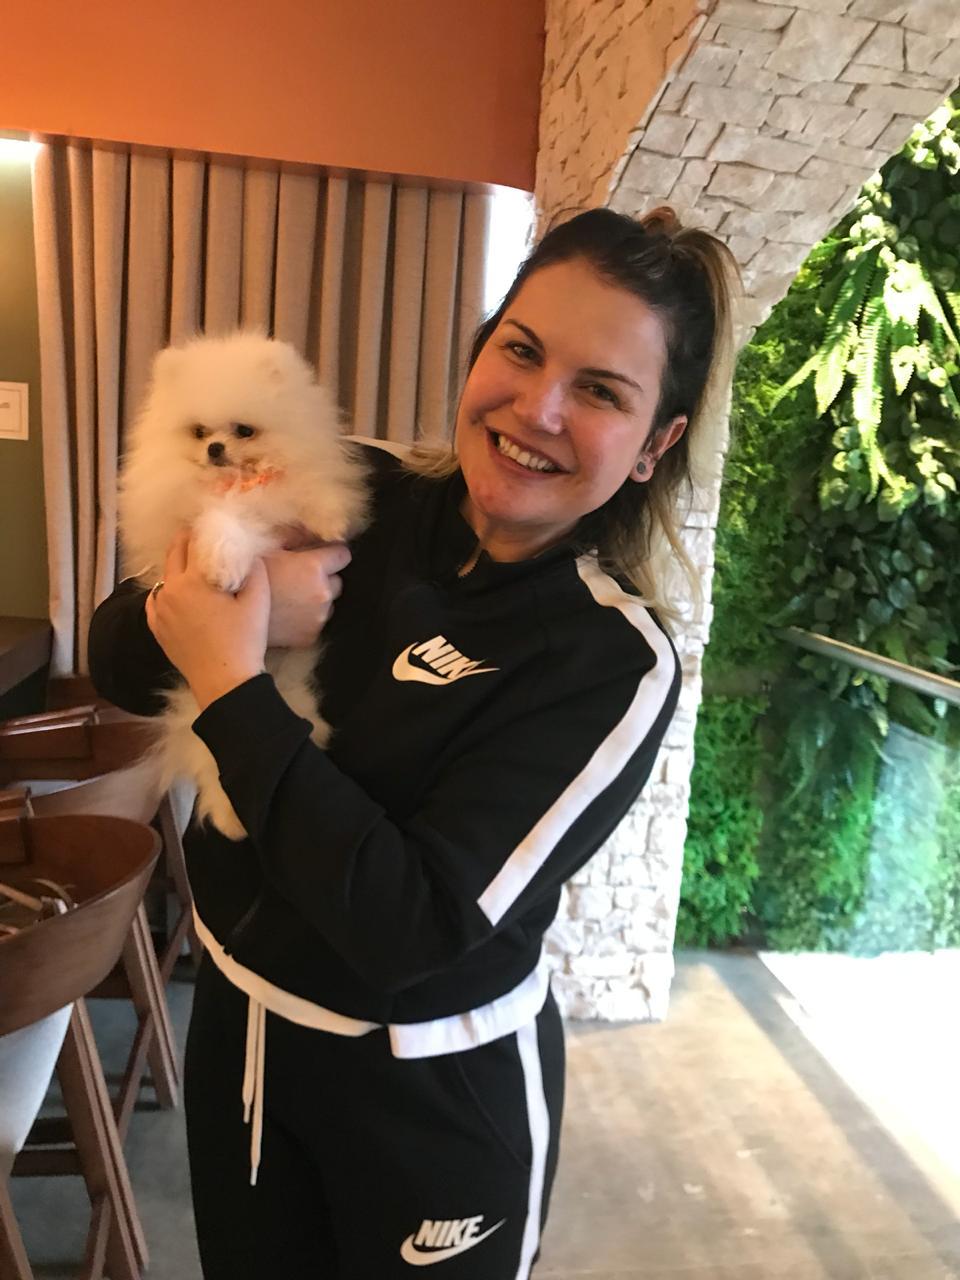 Irmã do jogador Cristiano Ronaldo, Kathia Aveiro, cliente do Canil Benatti